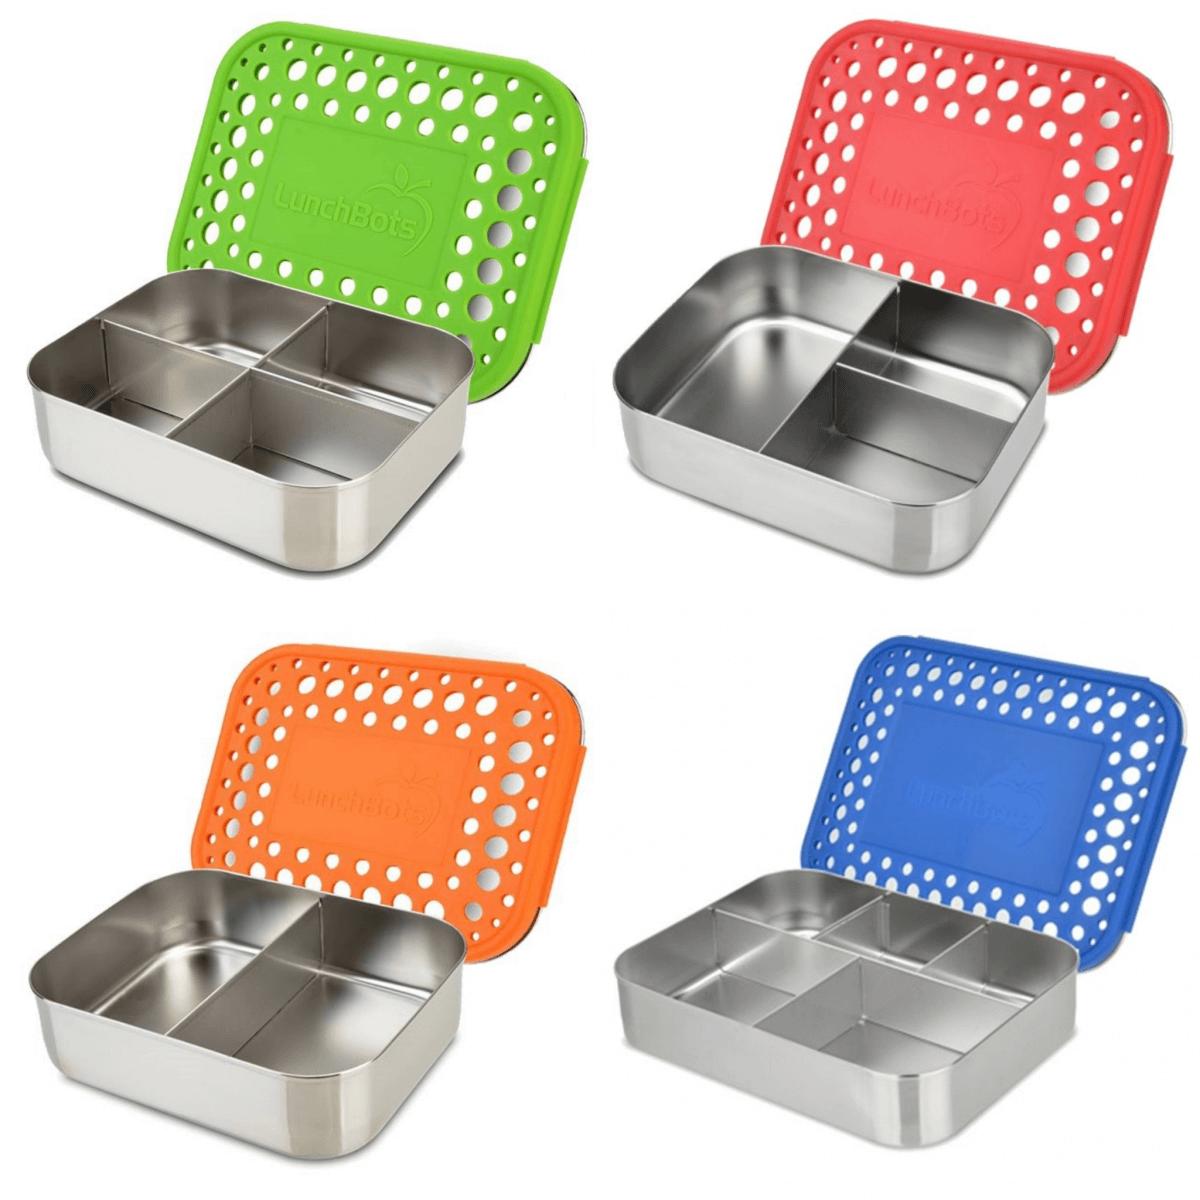 RVS eco lunchbox van LunchBots